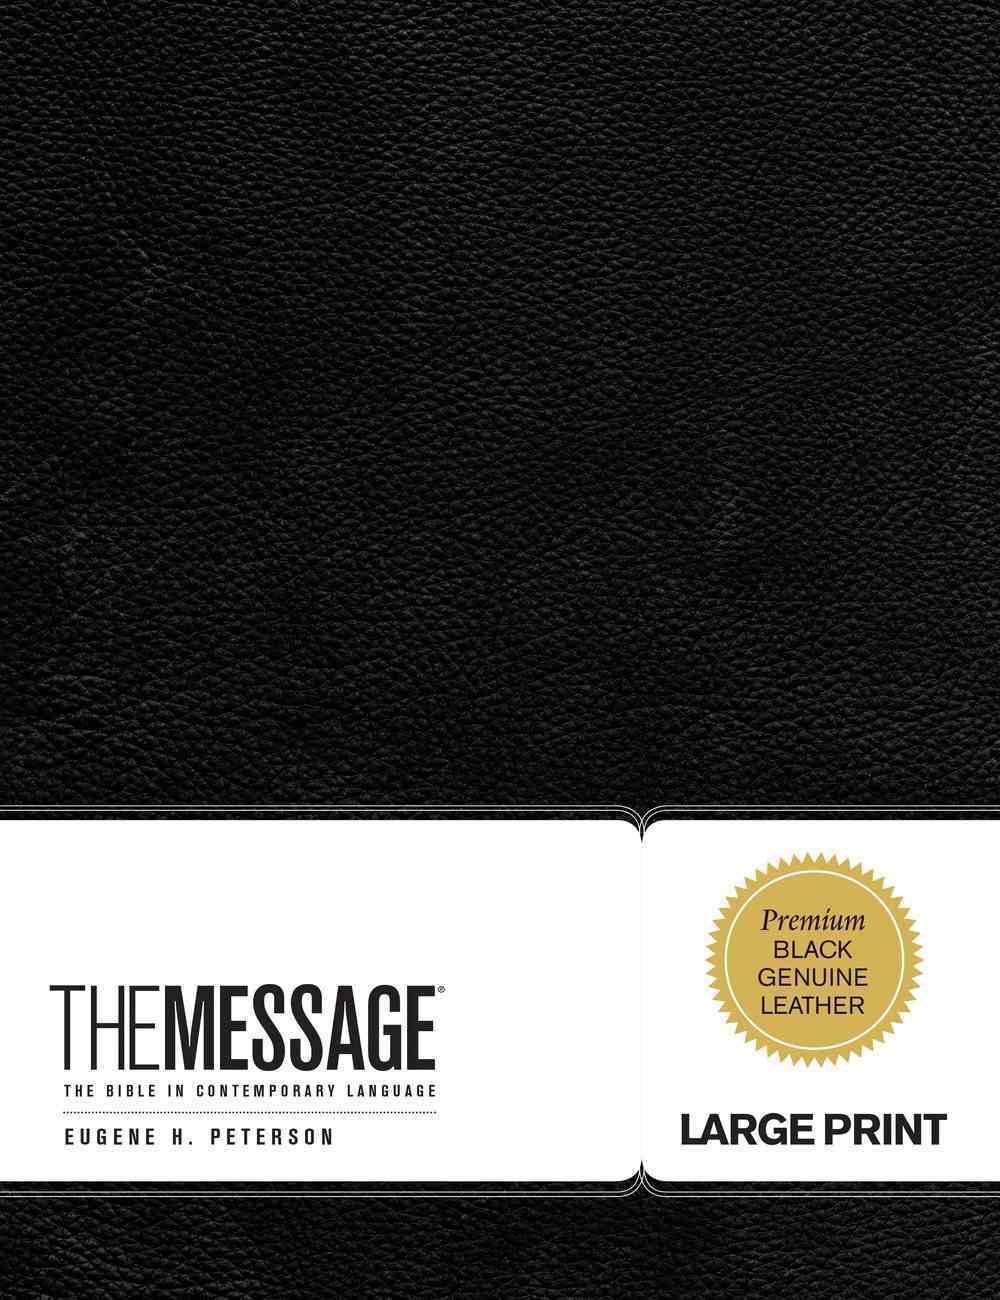 Message Large Print Black (Black Letter Edition) Genuine Leather